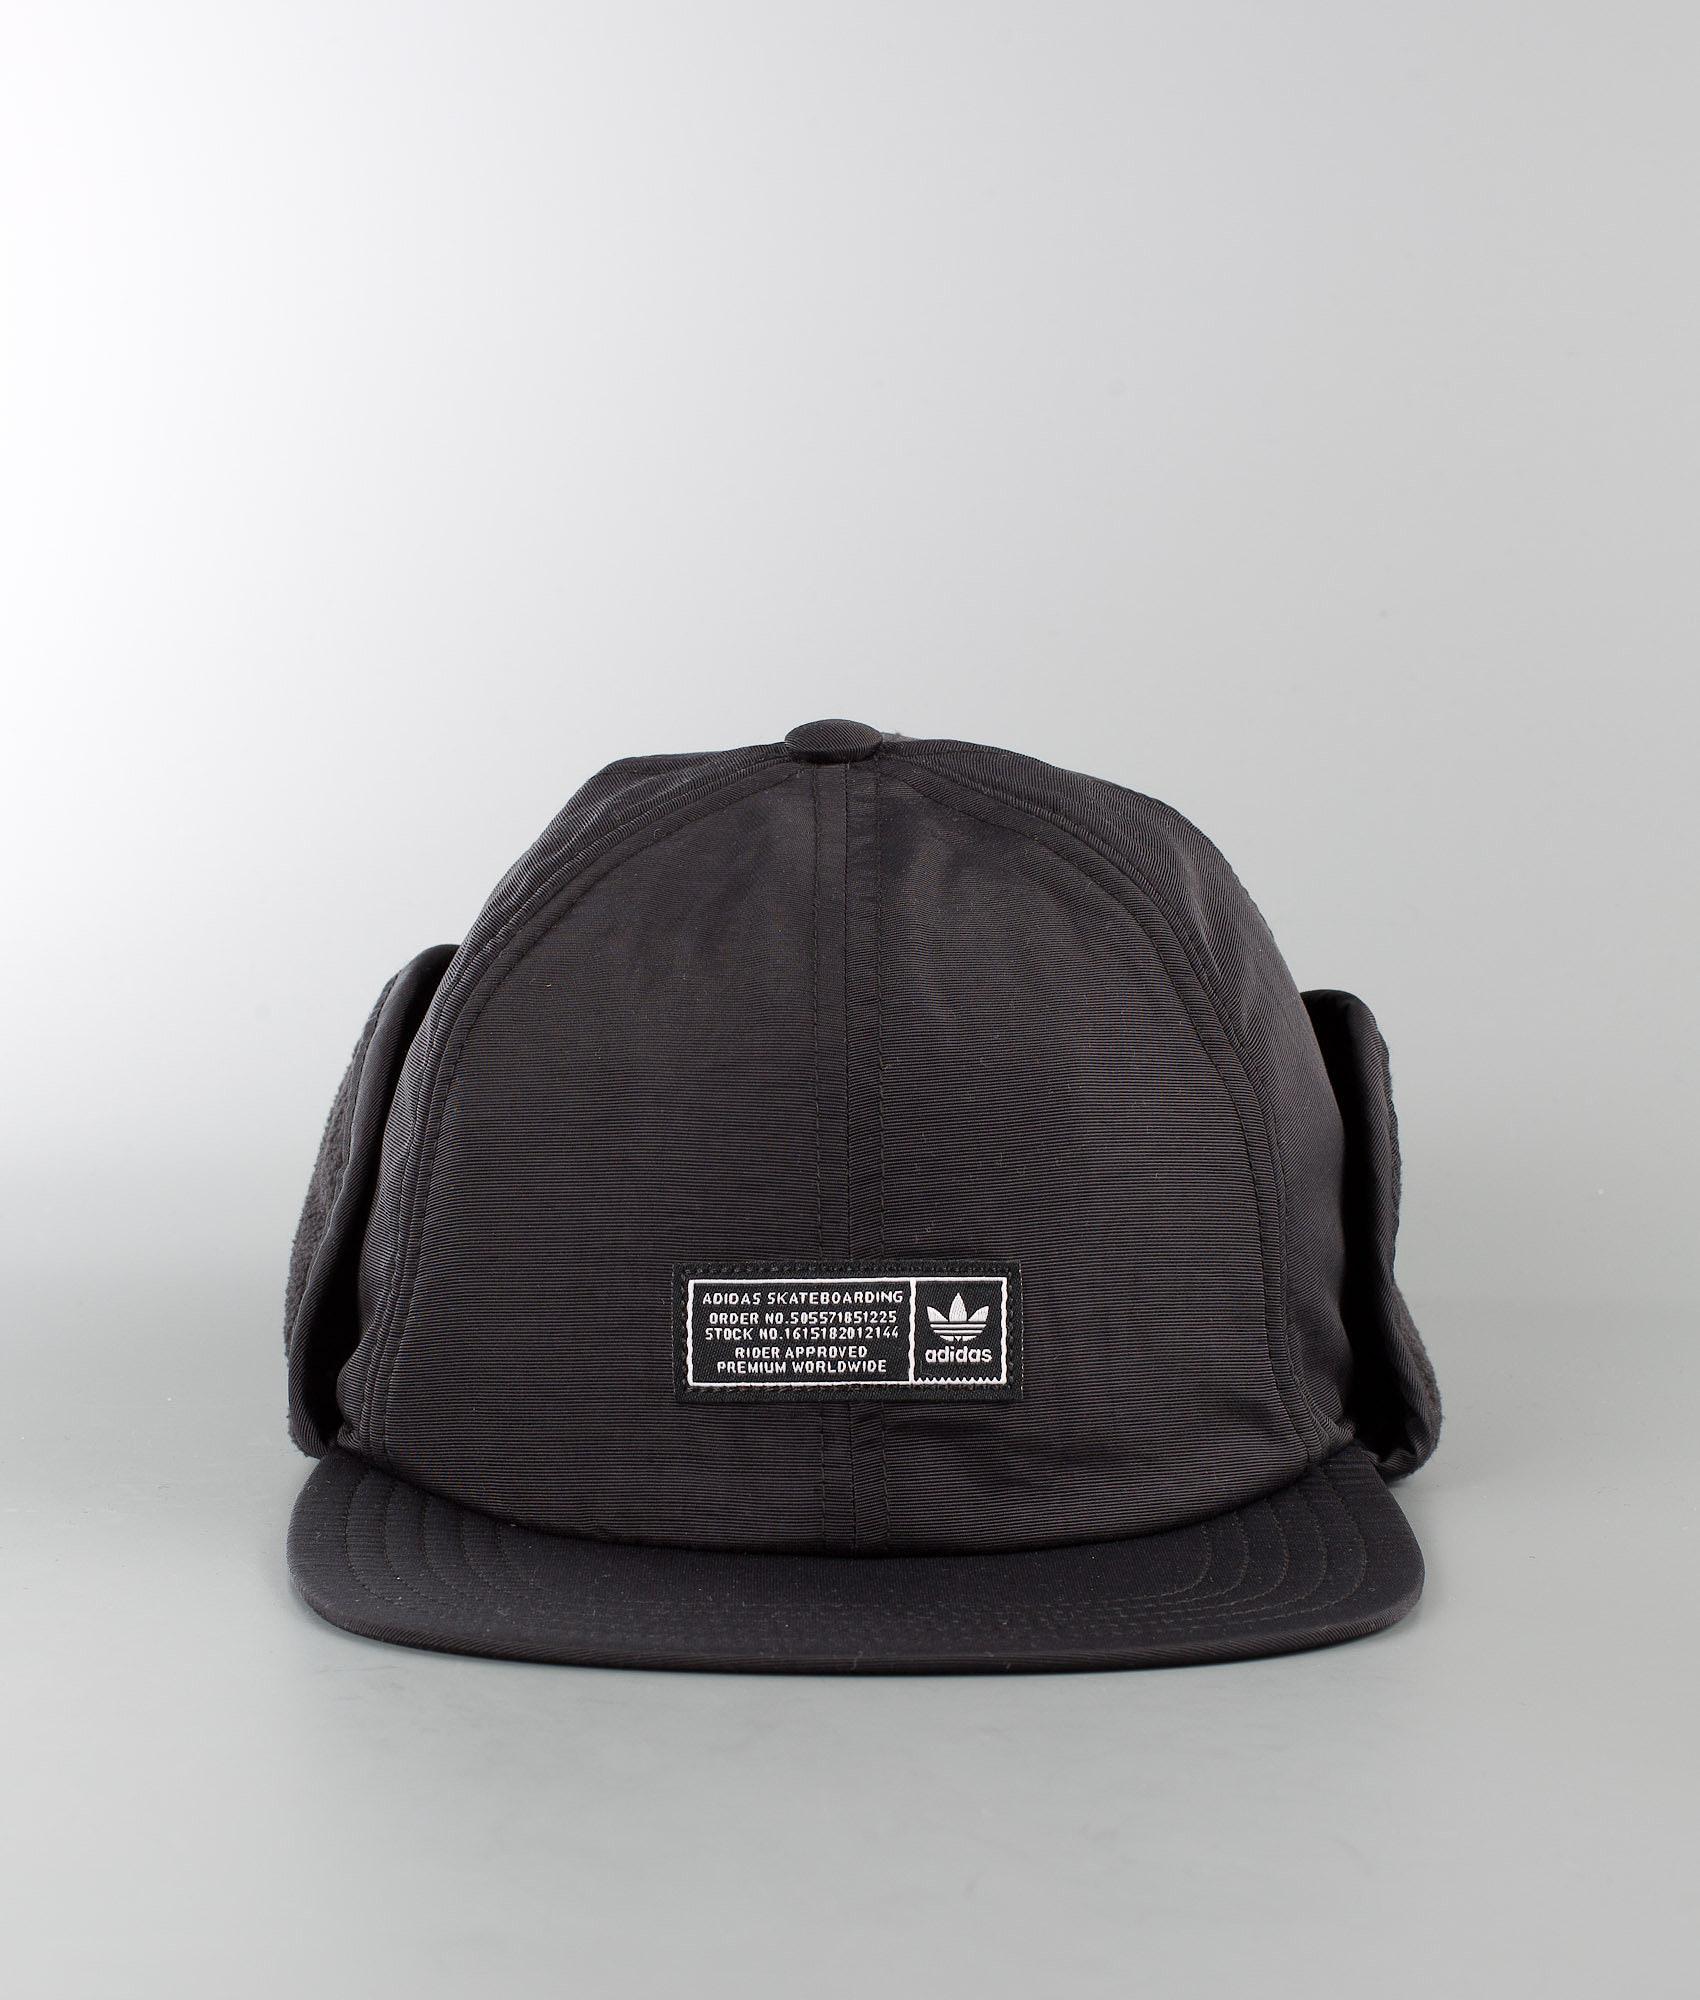 8b699f5af0c9f8 Adidas Skateboarding Winter Cap Caps Black - Ridestore.no